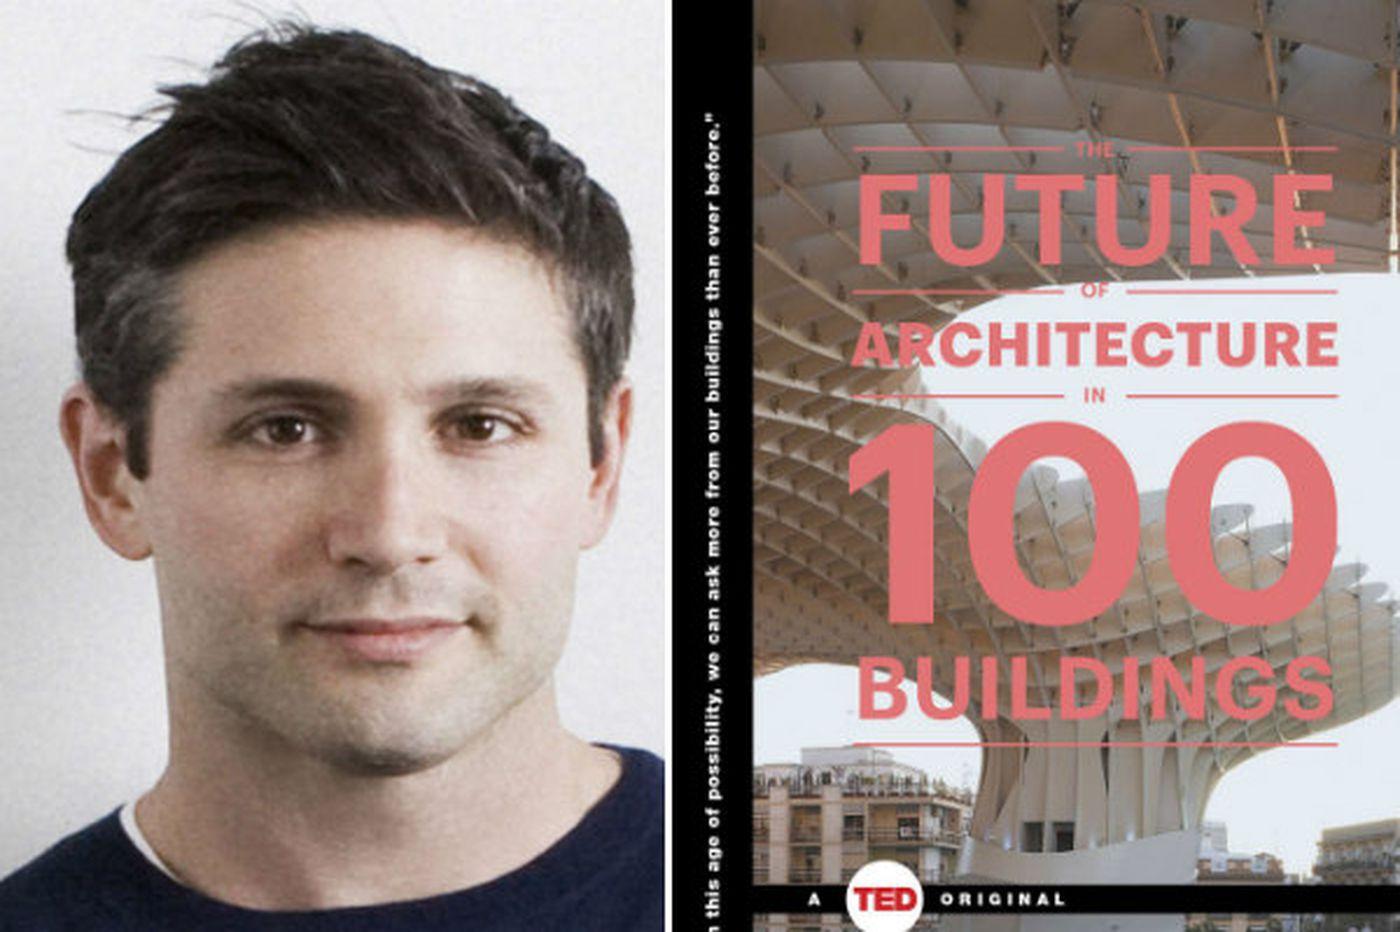 Marc Kushner dances about architecture